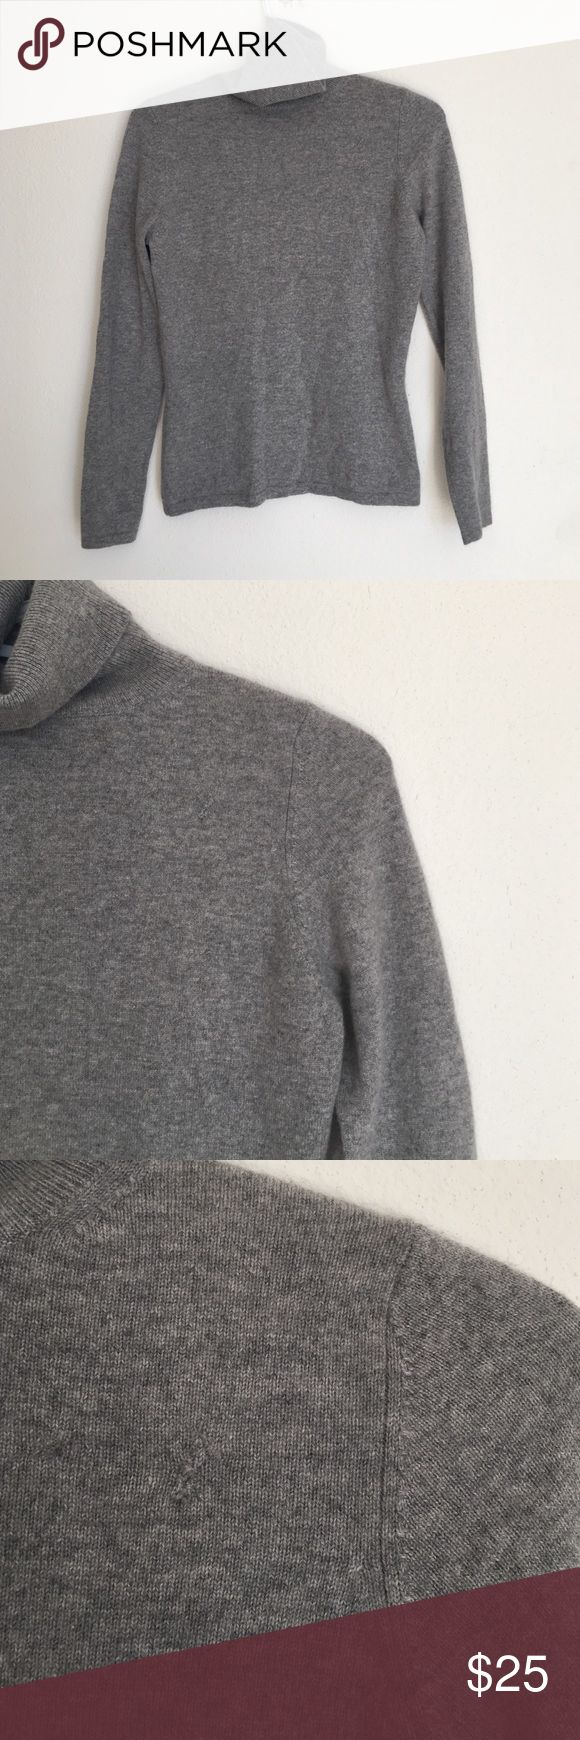 ❗️SALE❗️Neiman Marcus Cashmere sweater Neiman Marcus Cashmere sweater. Has a few fixes but is a great layering piece. Neiman Marcus Sweaters Cowl & Turtlenecks